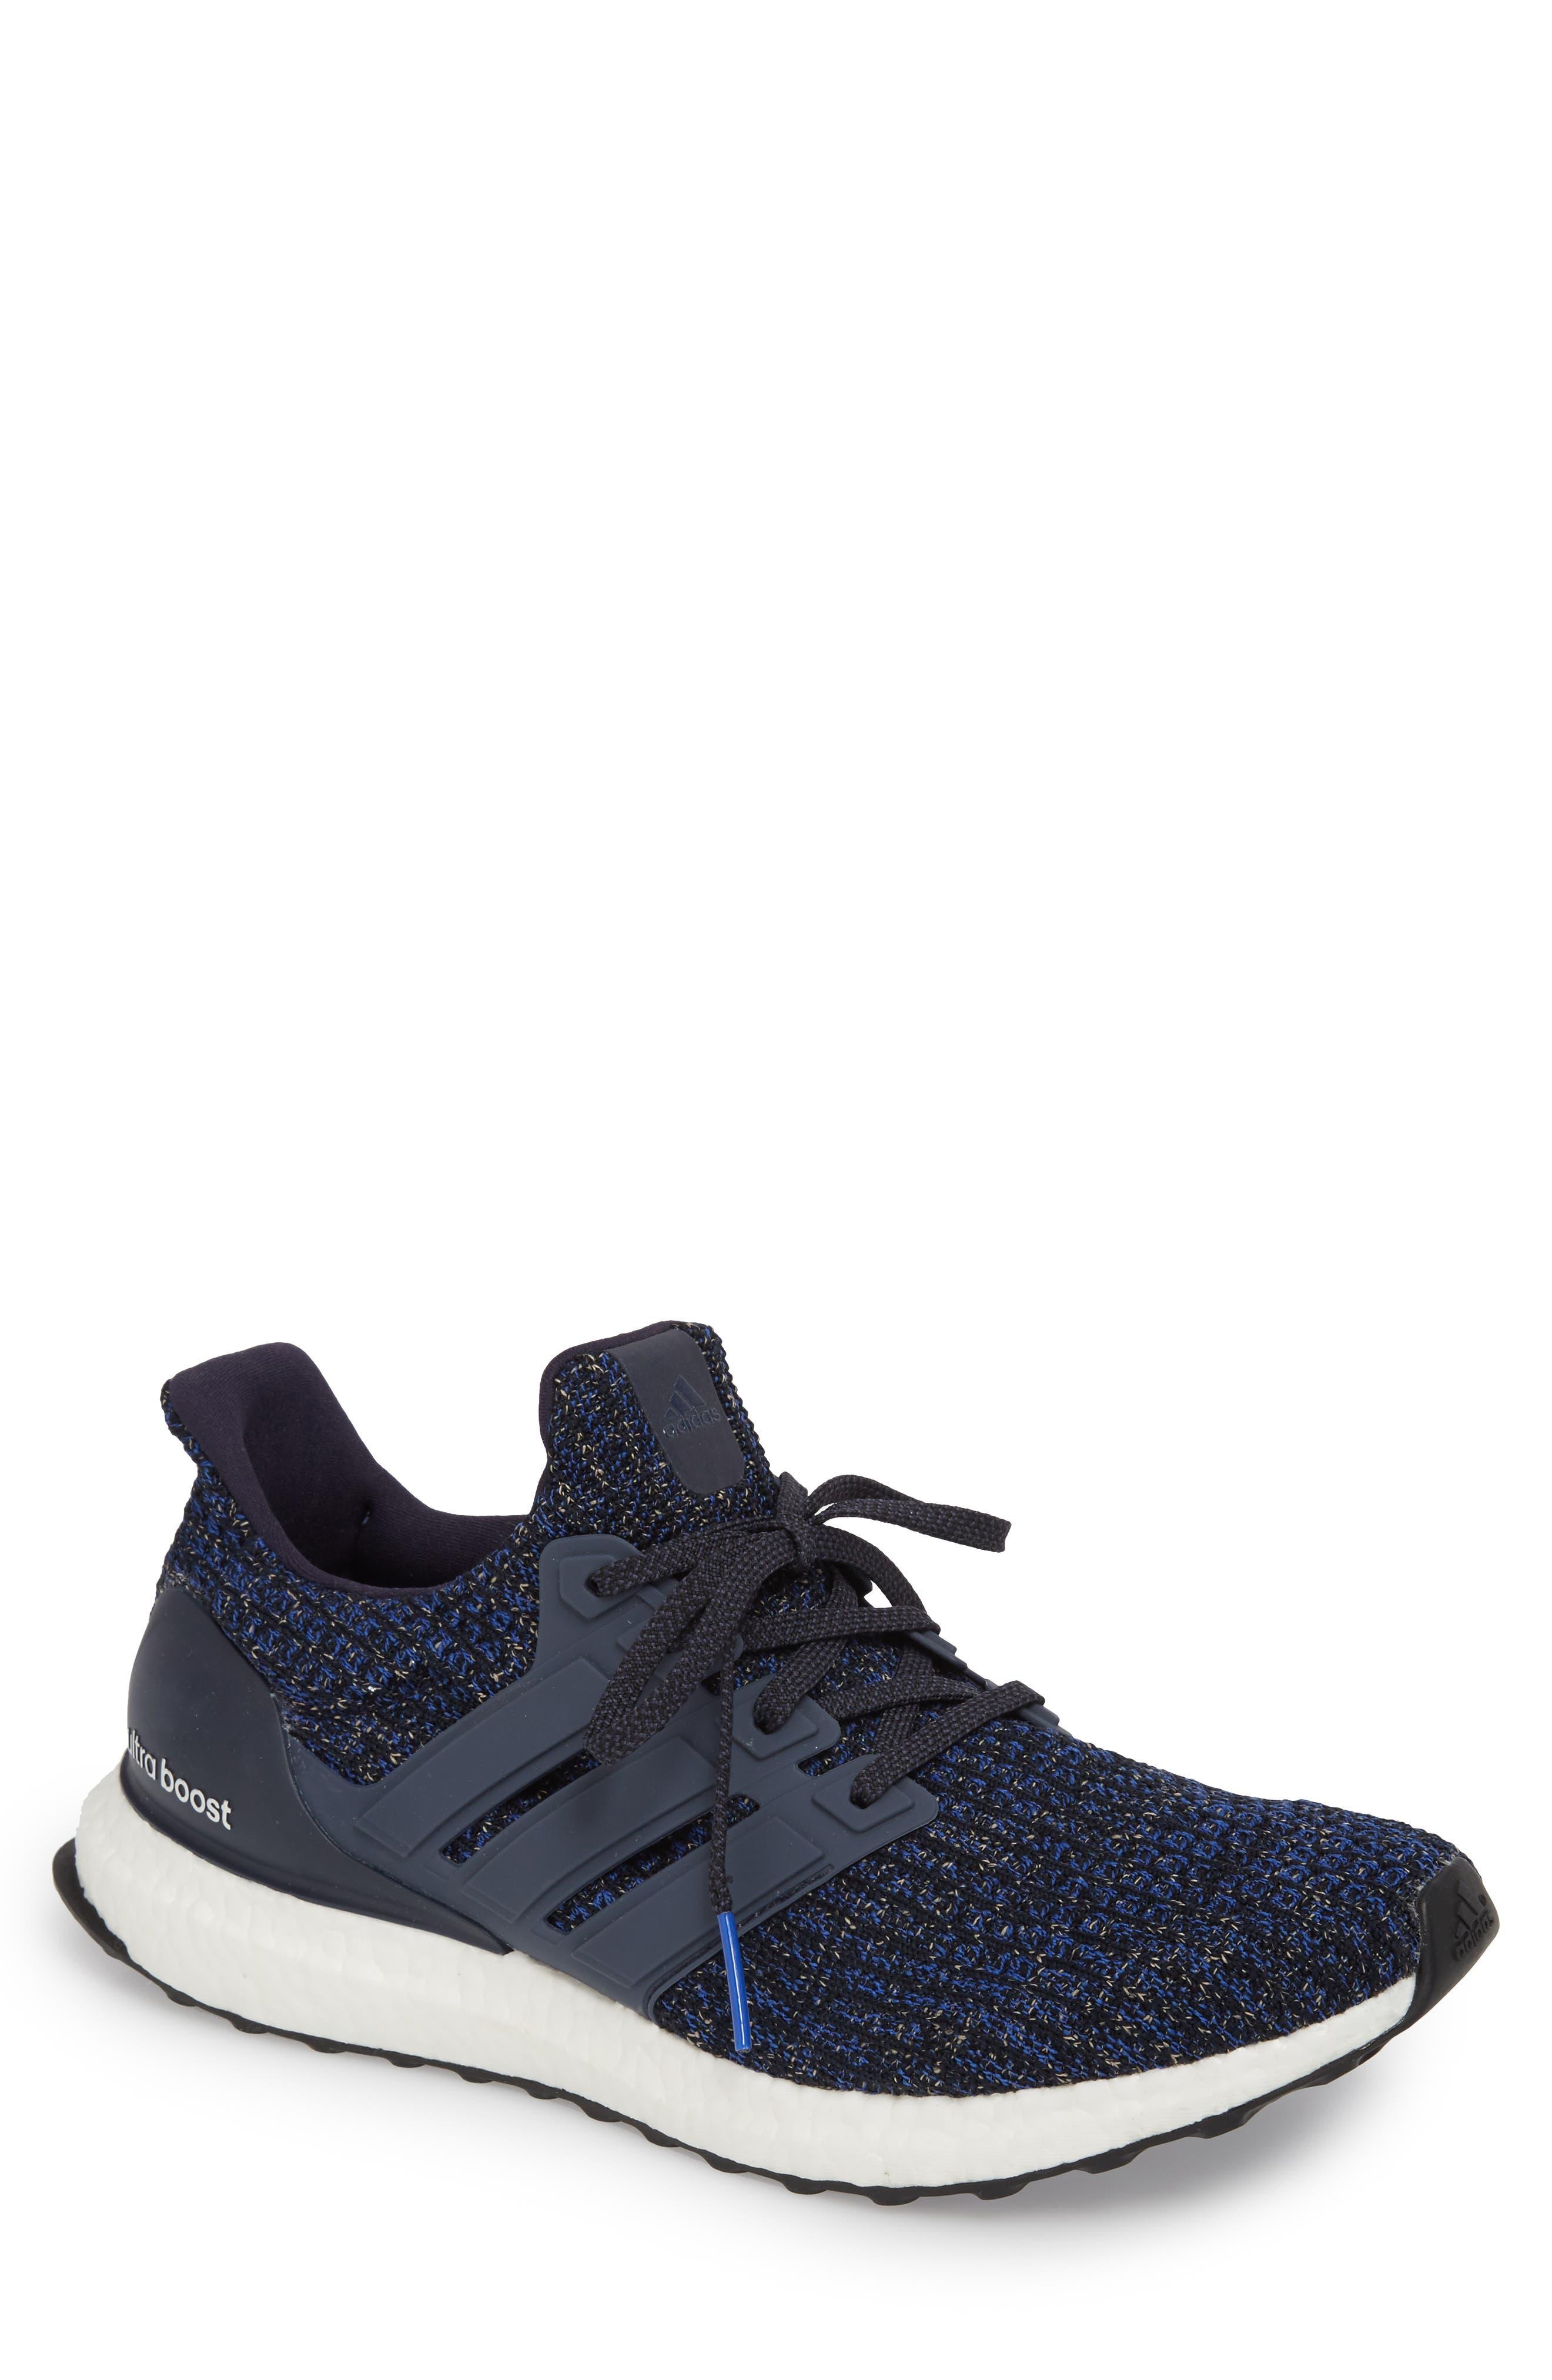 Main Image - adidas \u0027UltraBoost\u0027 Running Shoe (Men)